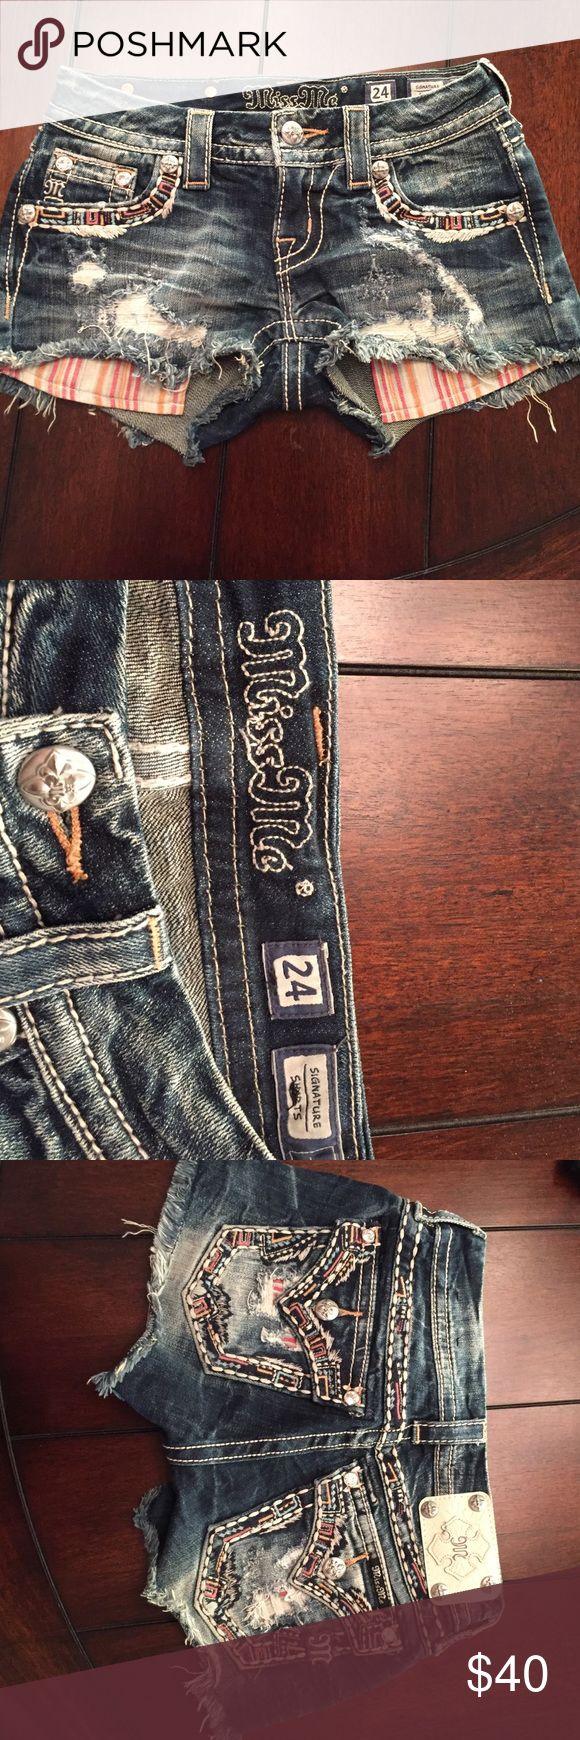 Miss Me Shorts. Adorable signature shorts. Special design. Miss Me. Size: 24 Miss Me Shorts Jean Shorts